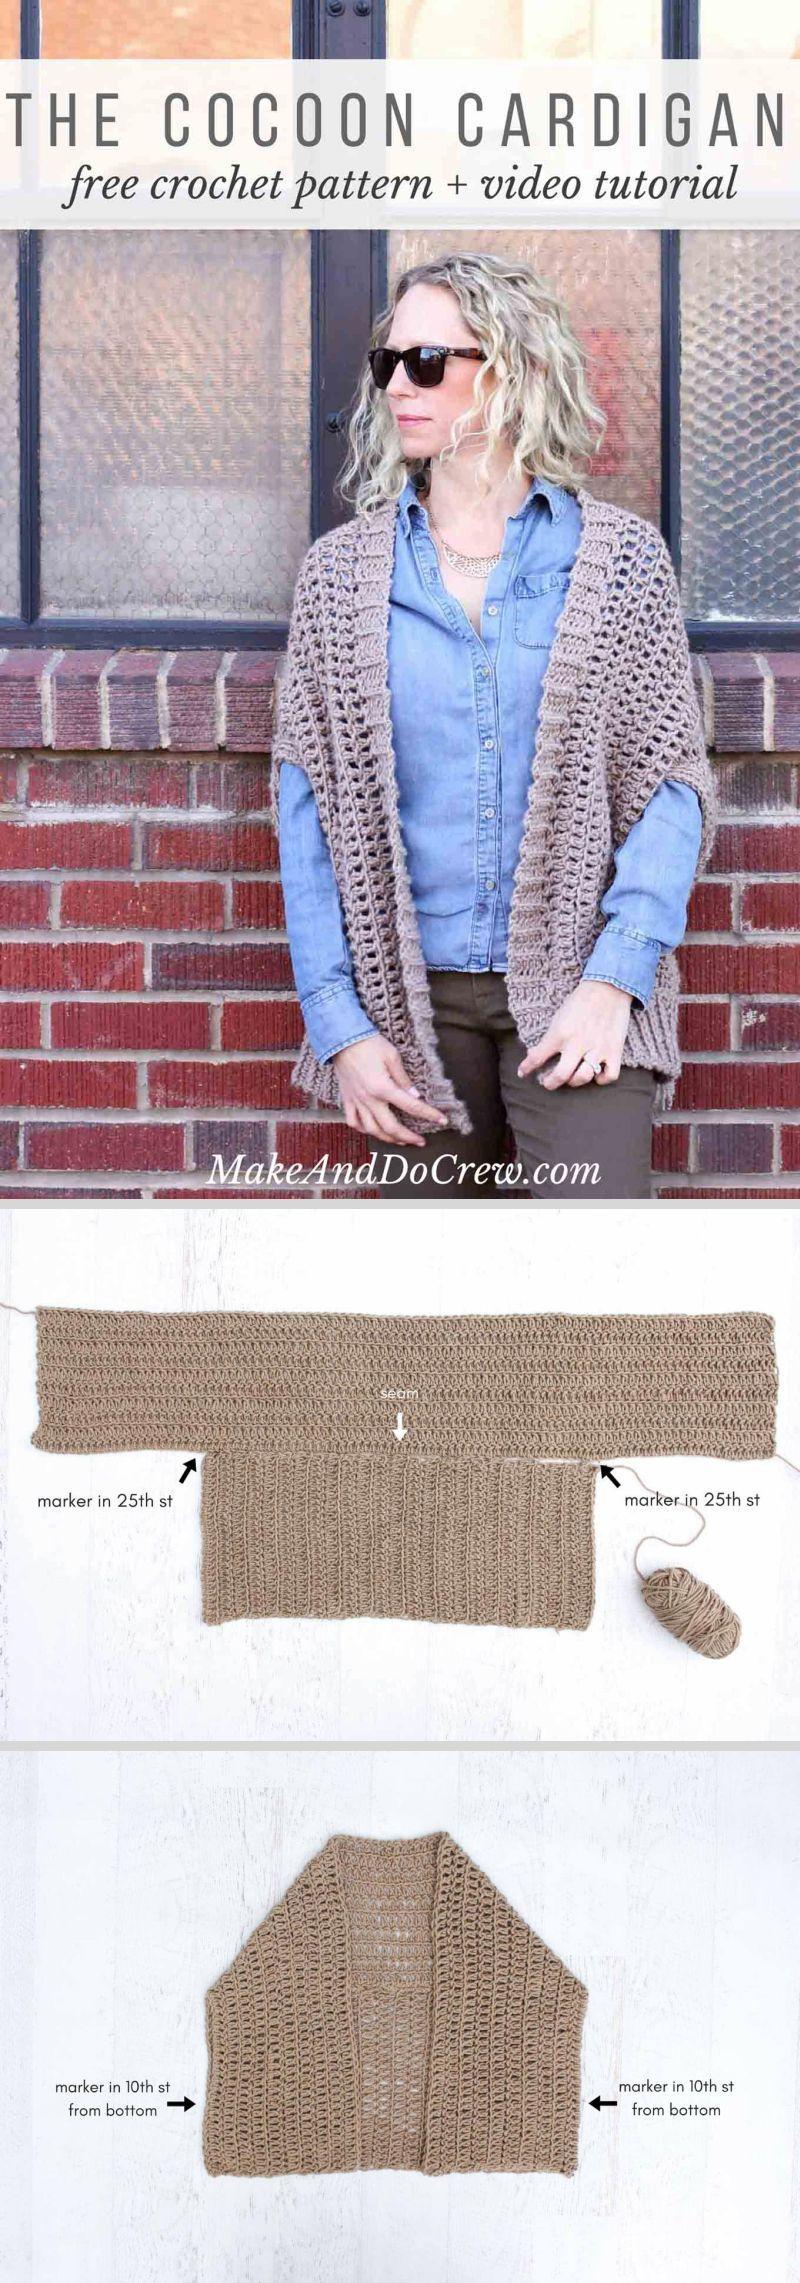 5fcc4412d687a Cocoon Cardigan Free Crochet Pattern